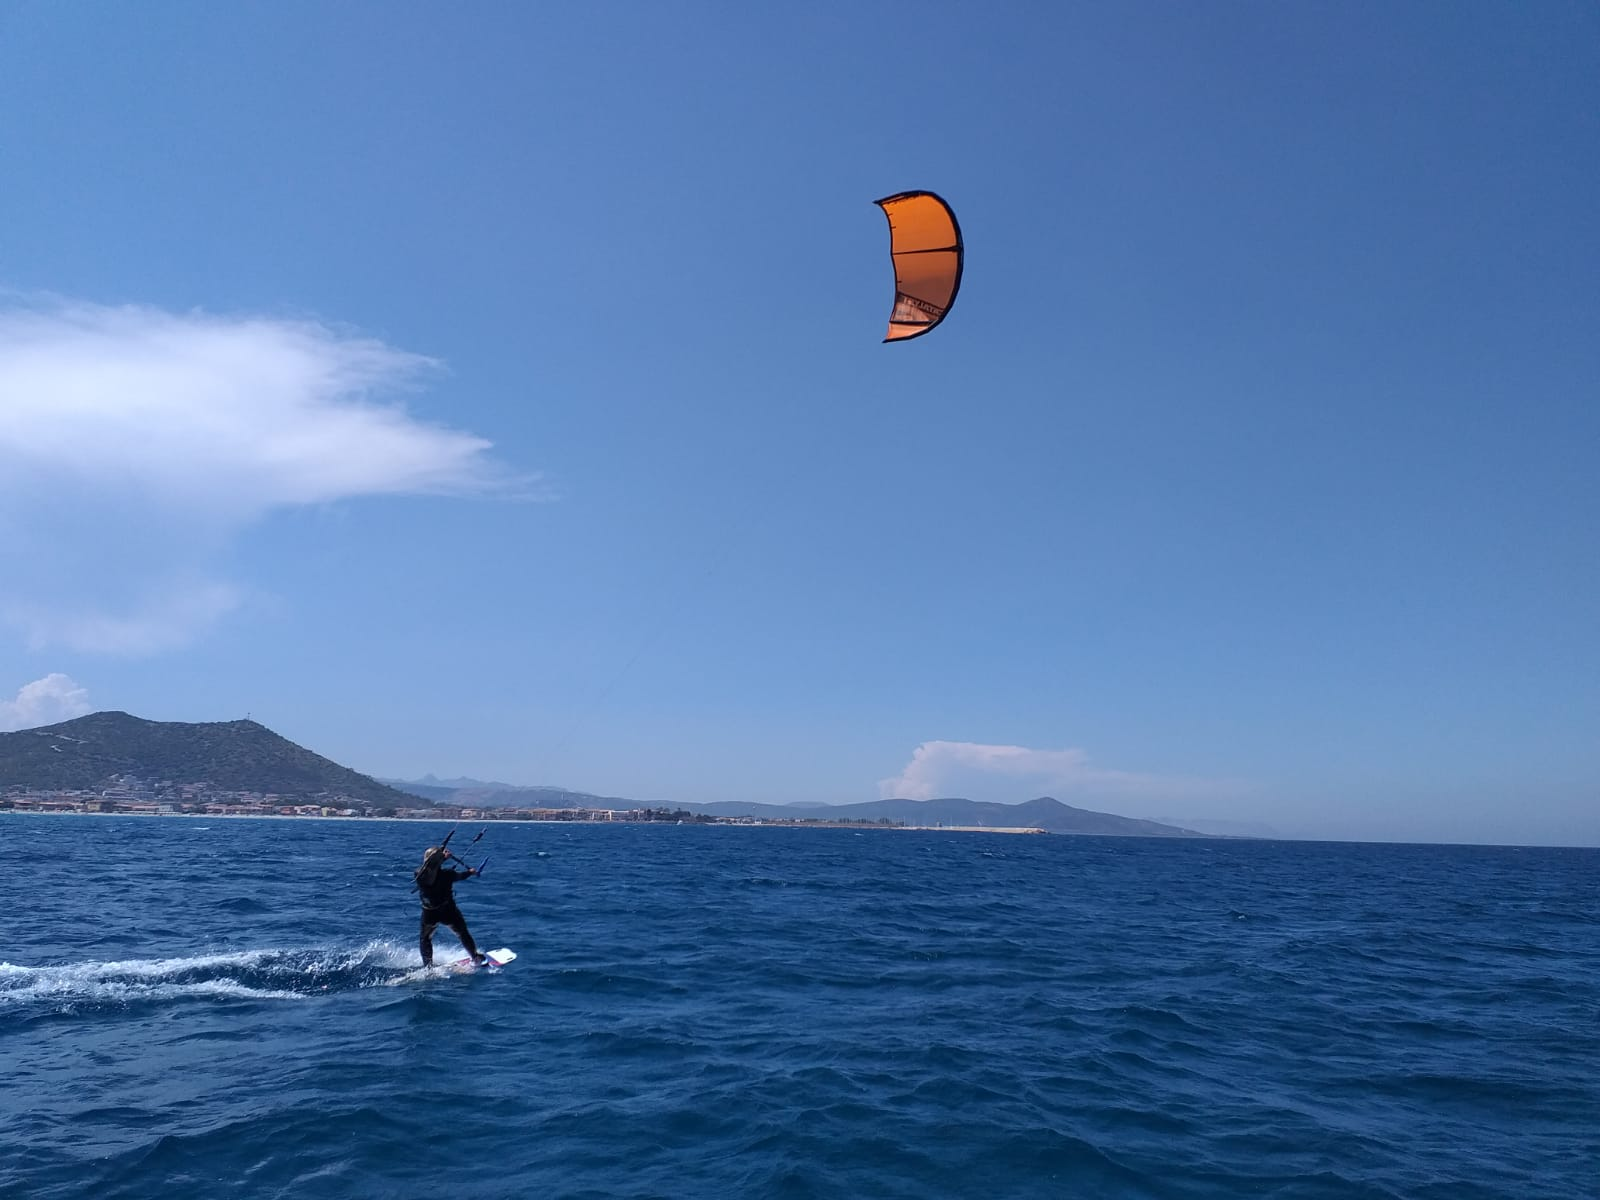 La Caletta kitesurf course: Sardinia beginner kitesurfing lessons